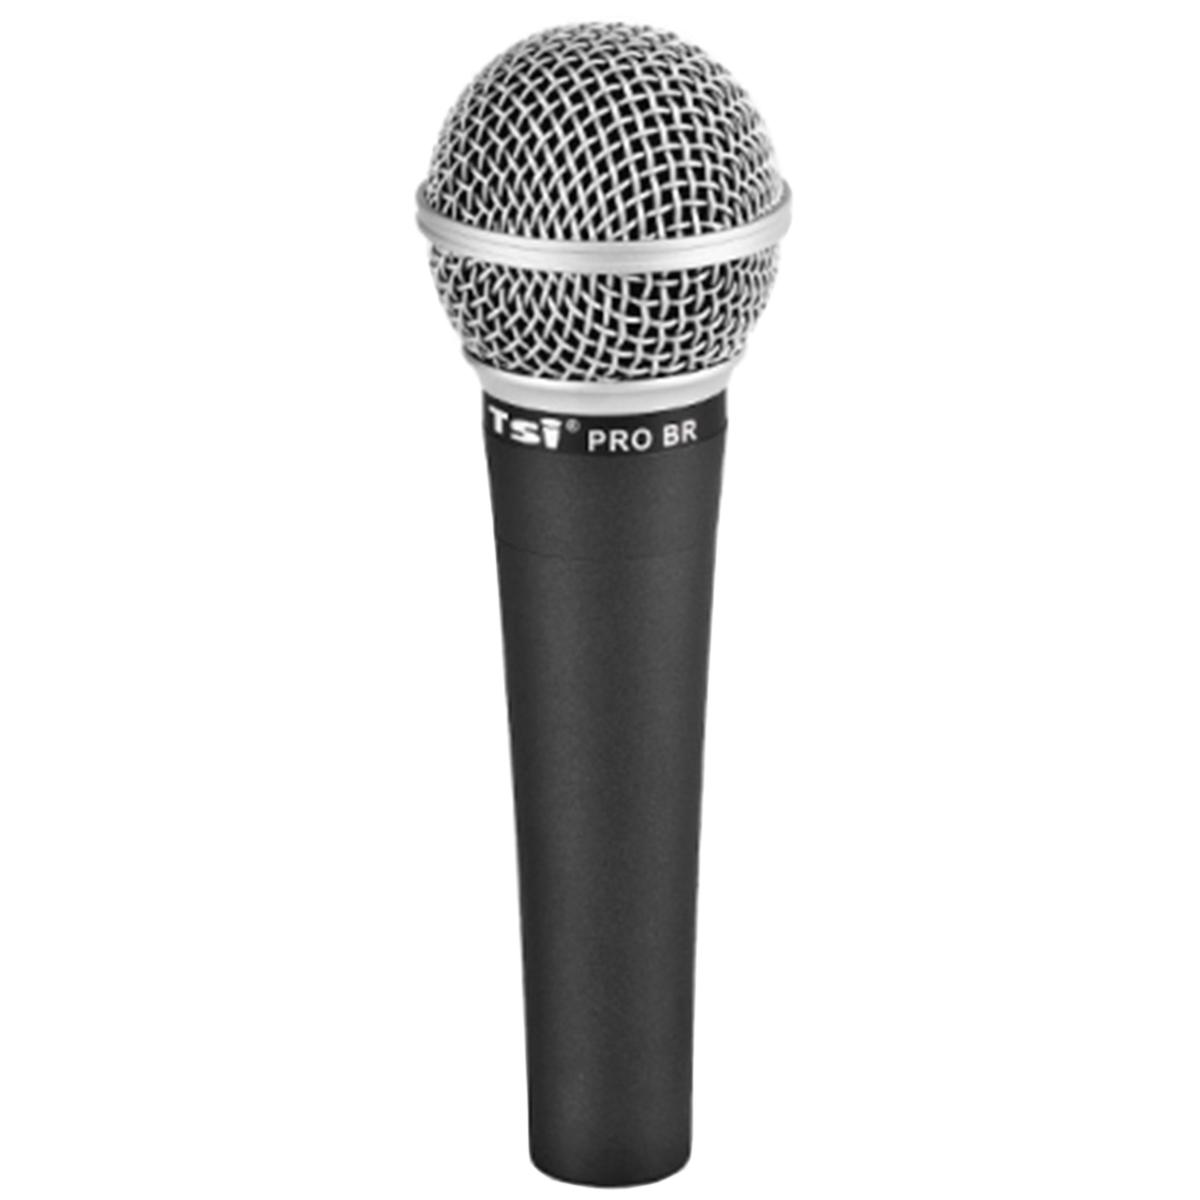 Microfone c/ Fio de Mão Dinâmico - PRO BR TSI